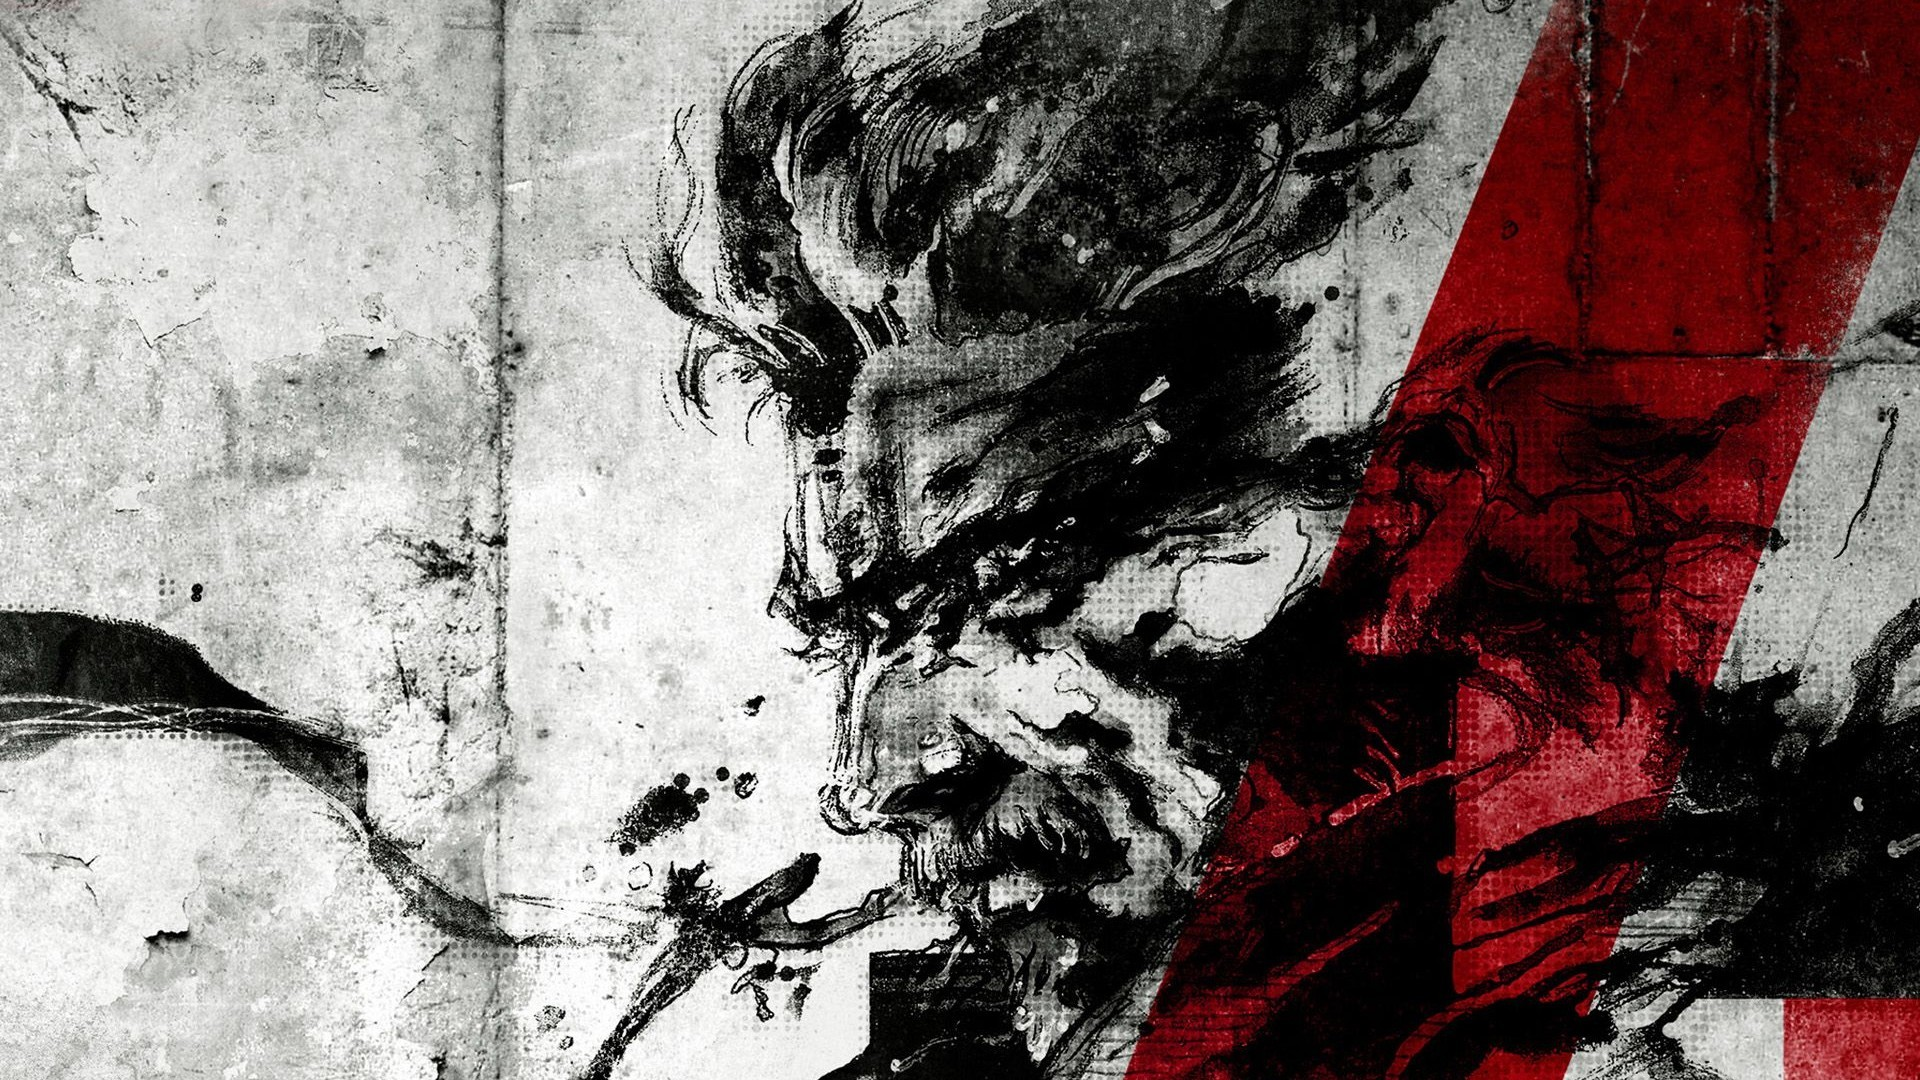 Metal Gear Solid 5 Wallpaper 1920×1080